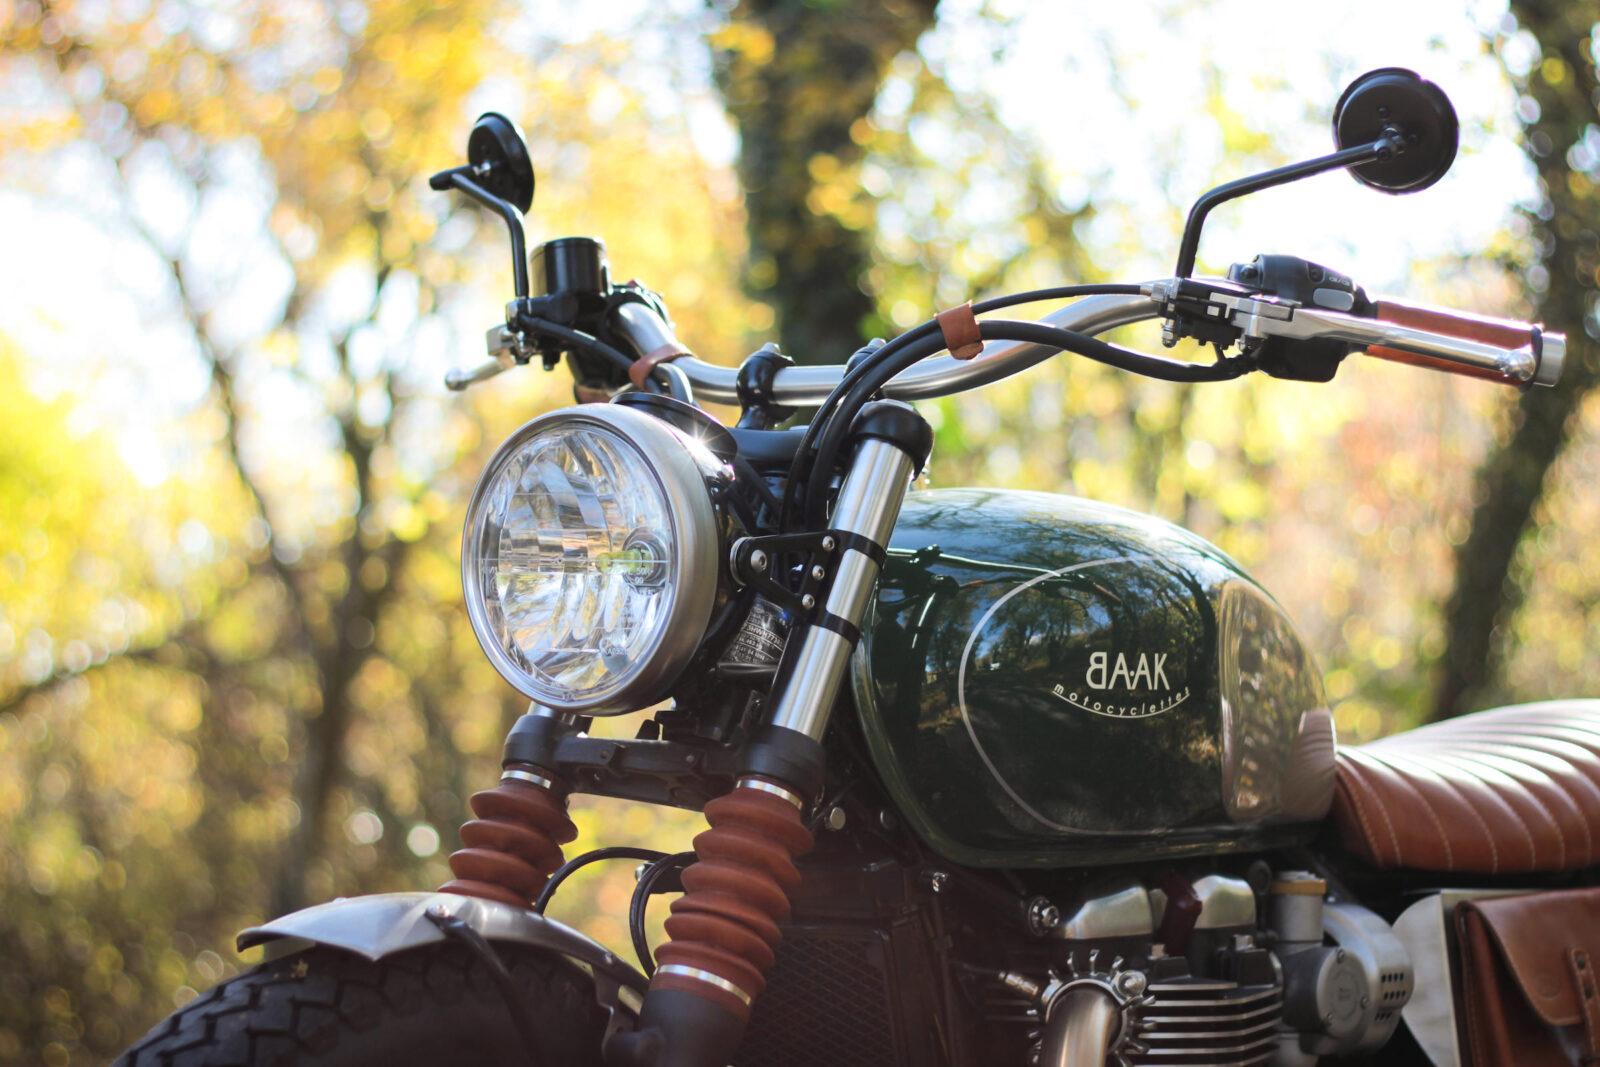 triumph bonneville t120 custom baak 9 1600x1067 - BAAK Motorcycles Custom Triumph Bonneville T120